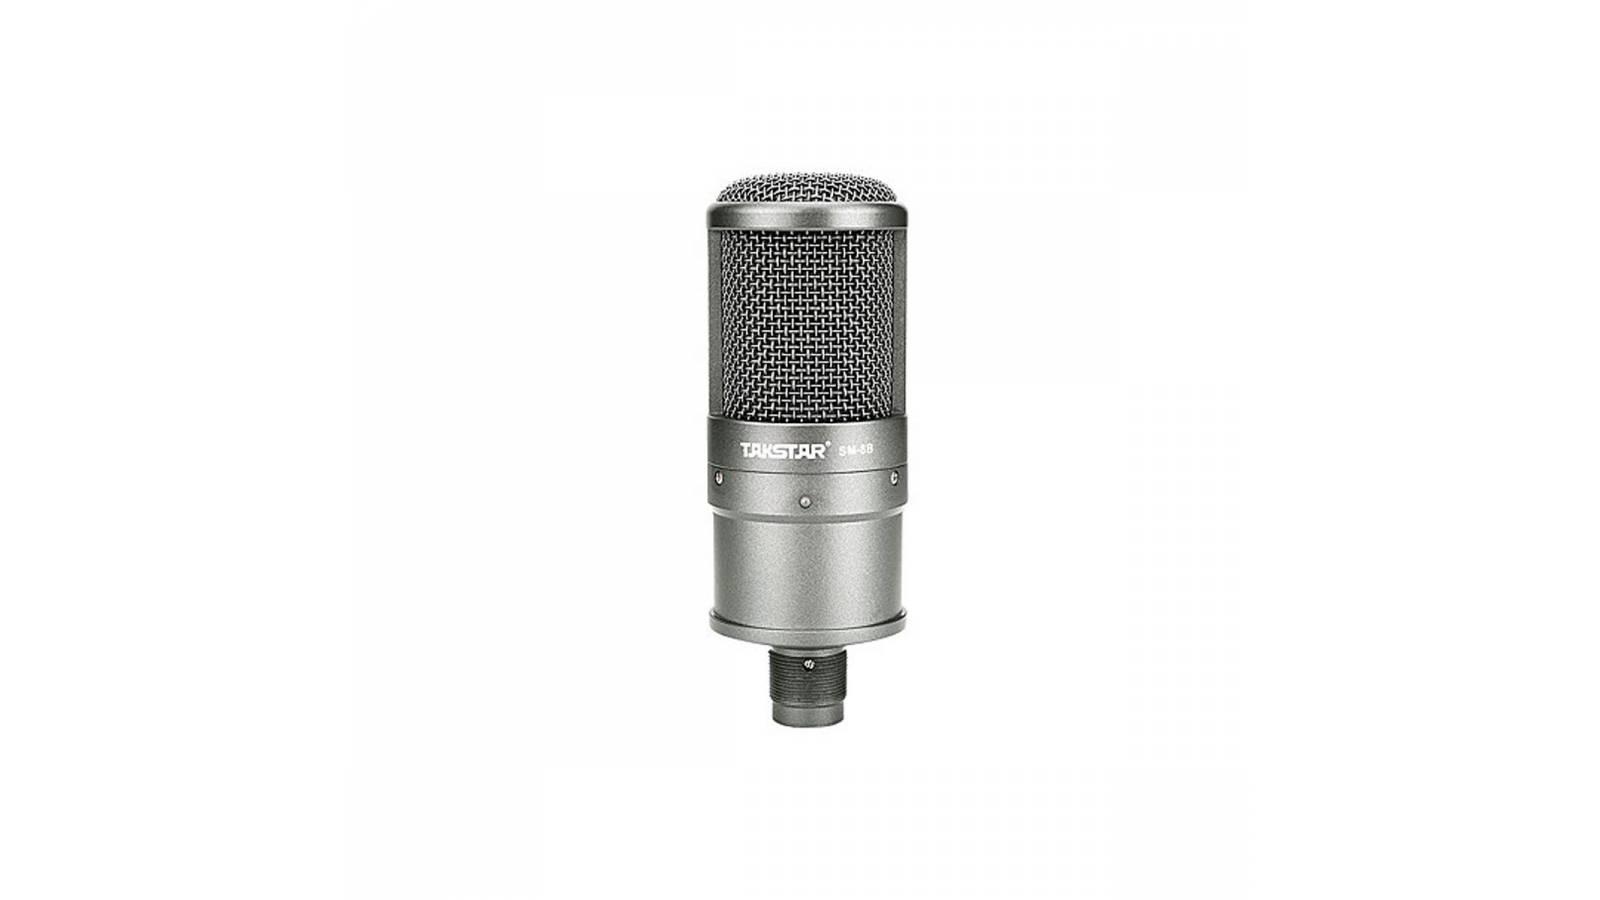 Microfono Condensador Takstar Sm8b Para Estudio De Grabación